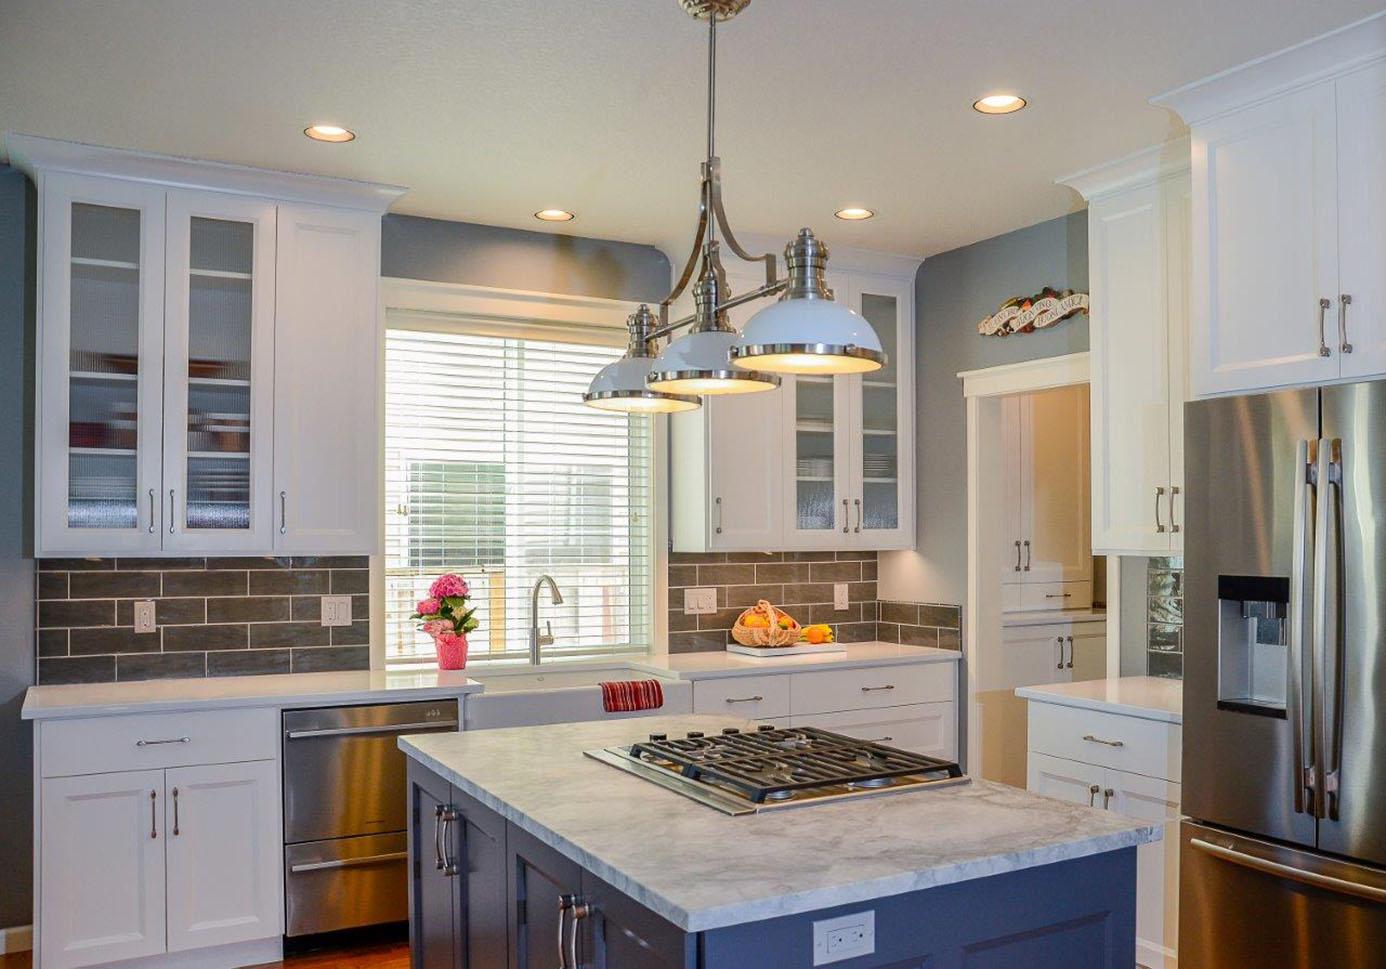 Sinclair-custom-kitchen-countertop-and-island